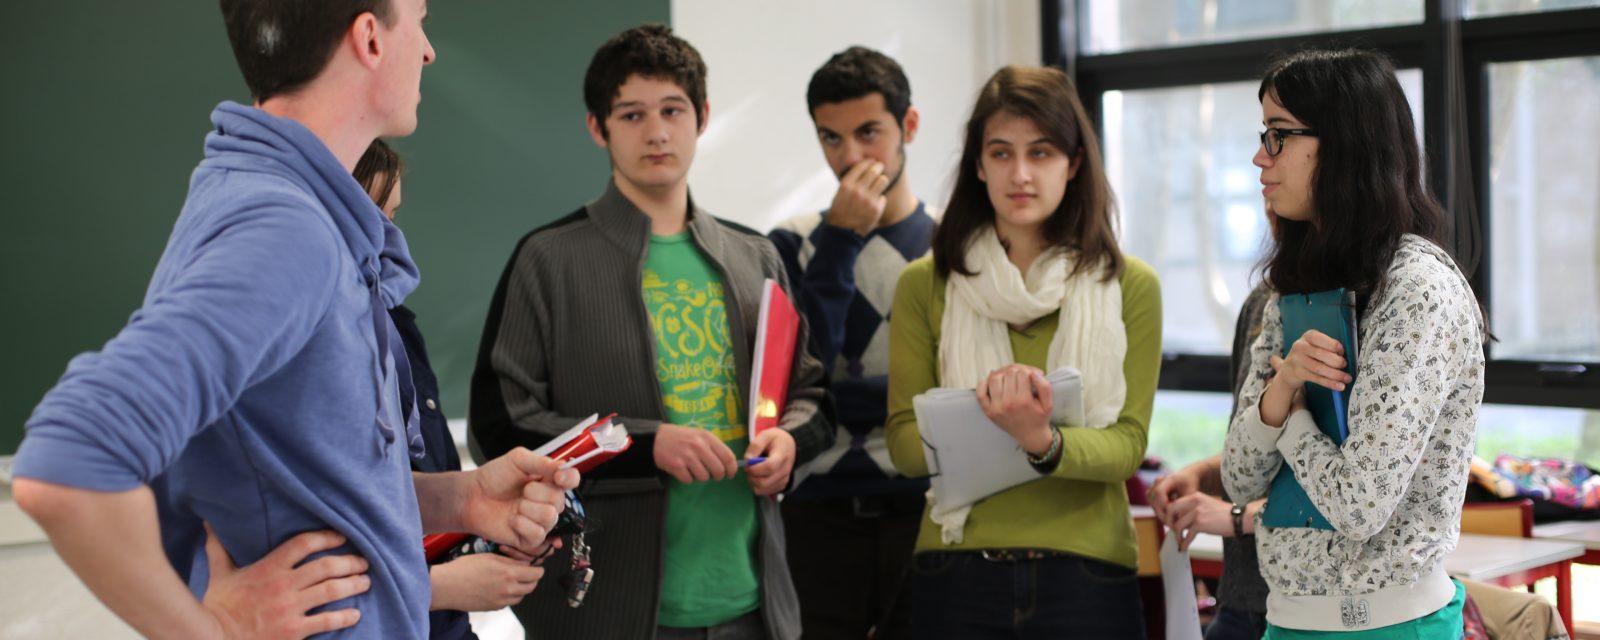 Recrutement d'un·e enseignant·e contractuel·lle en Espagnol